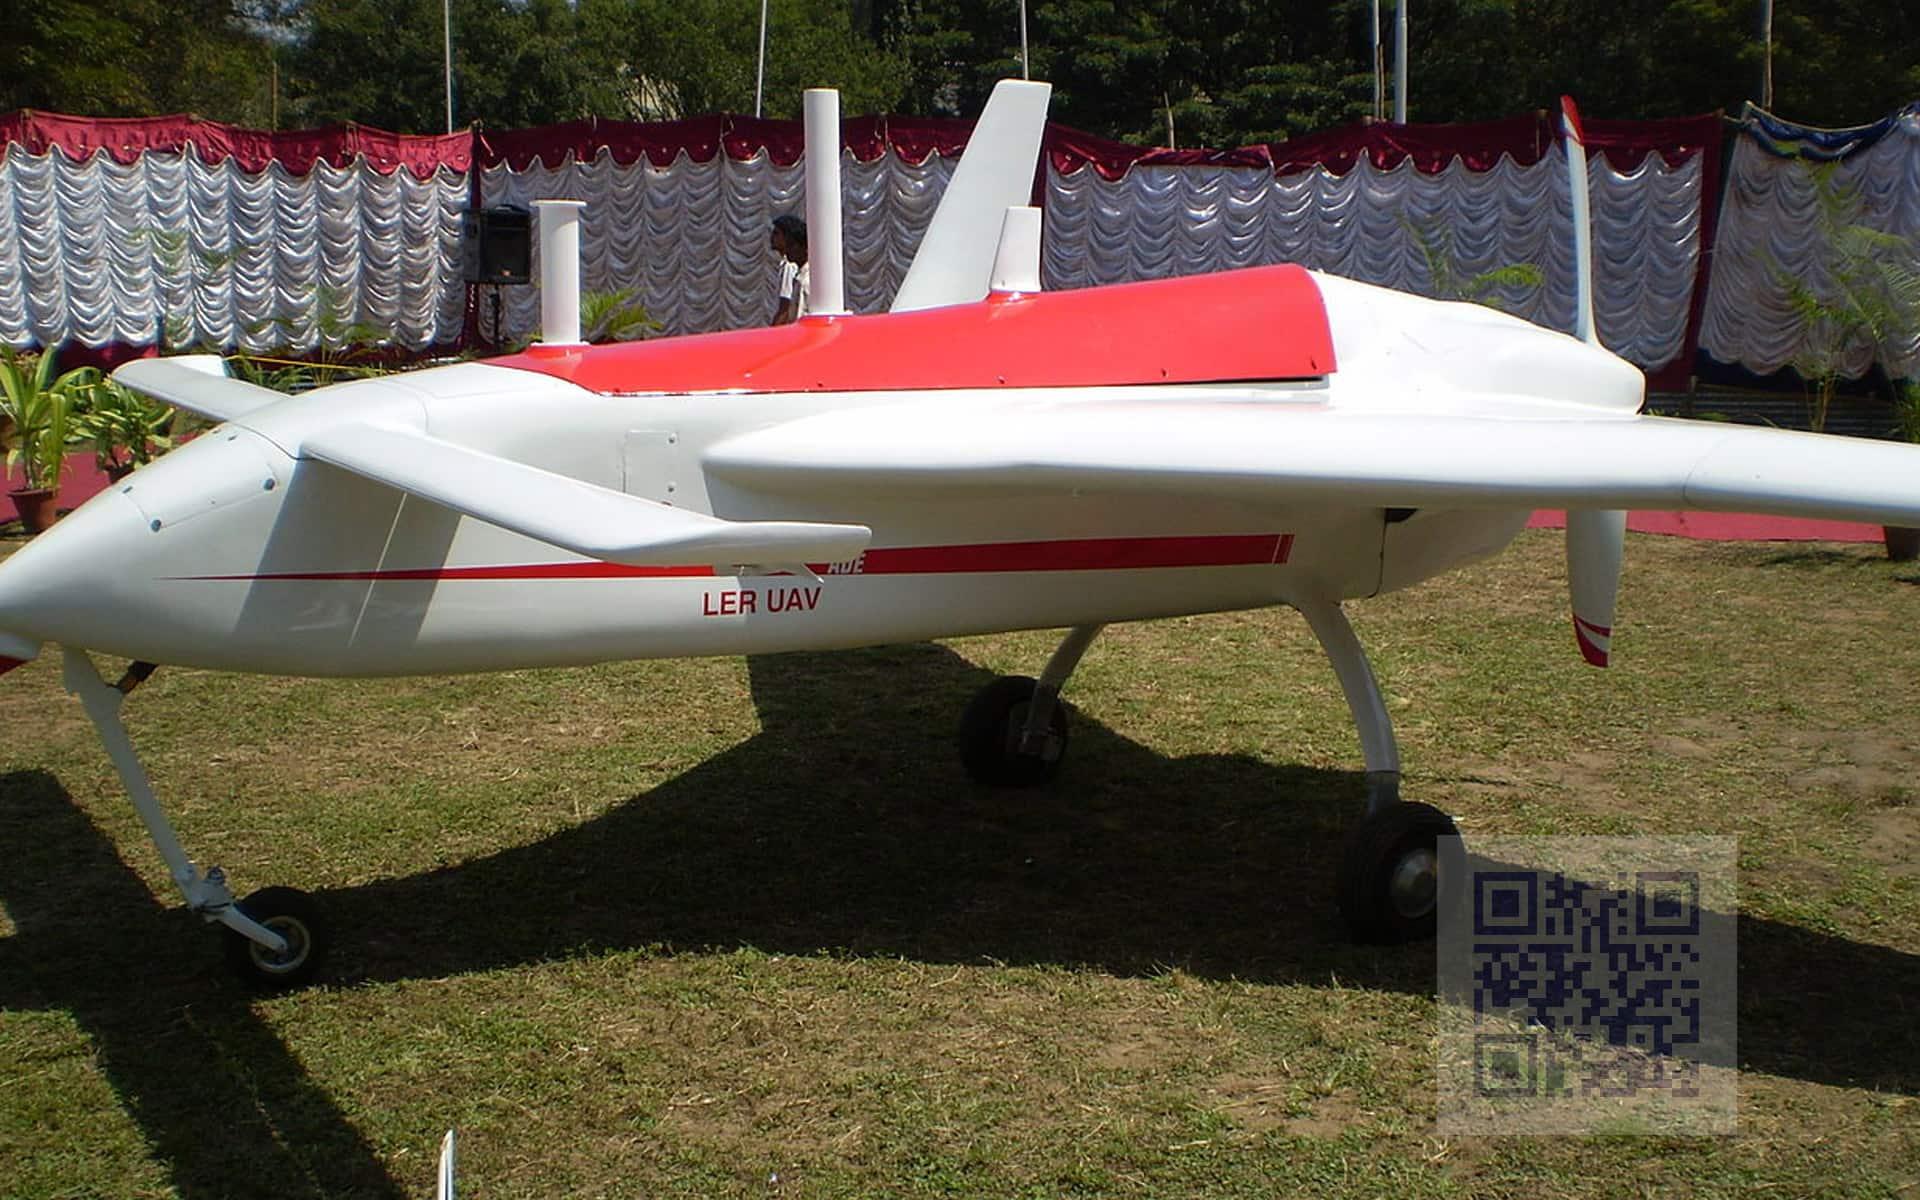 Rustom-1 UAV prototype